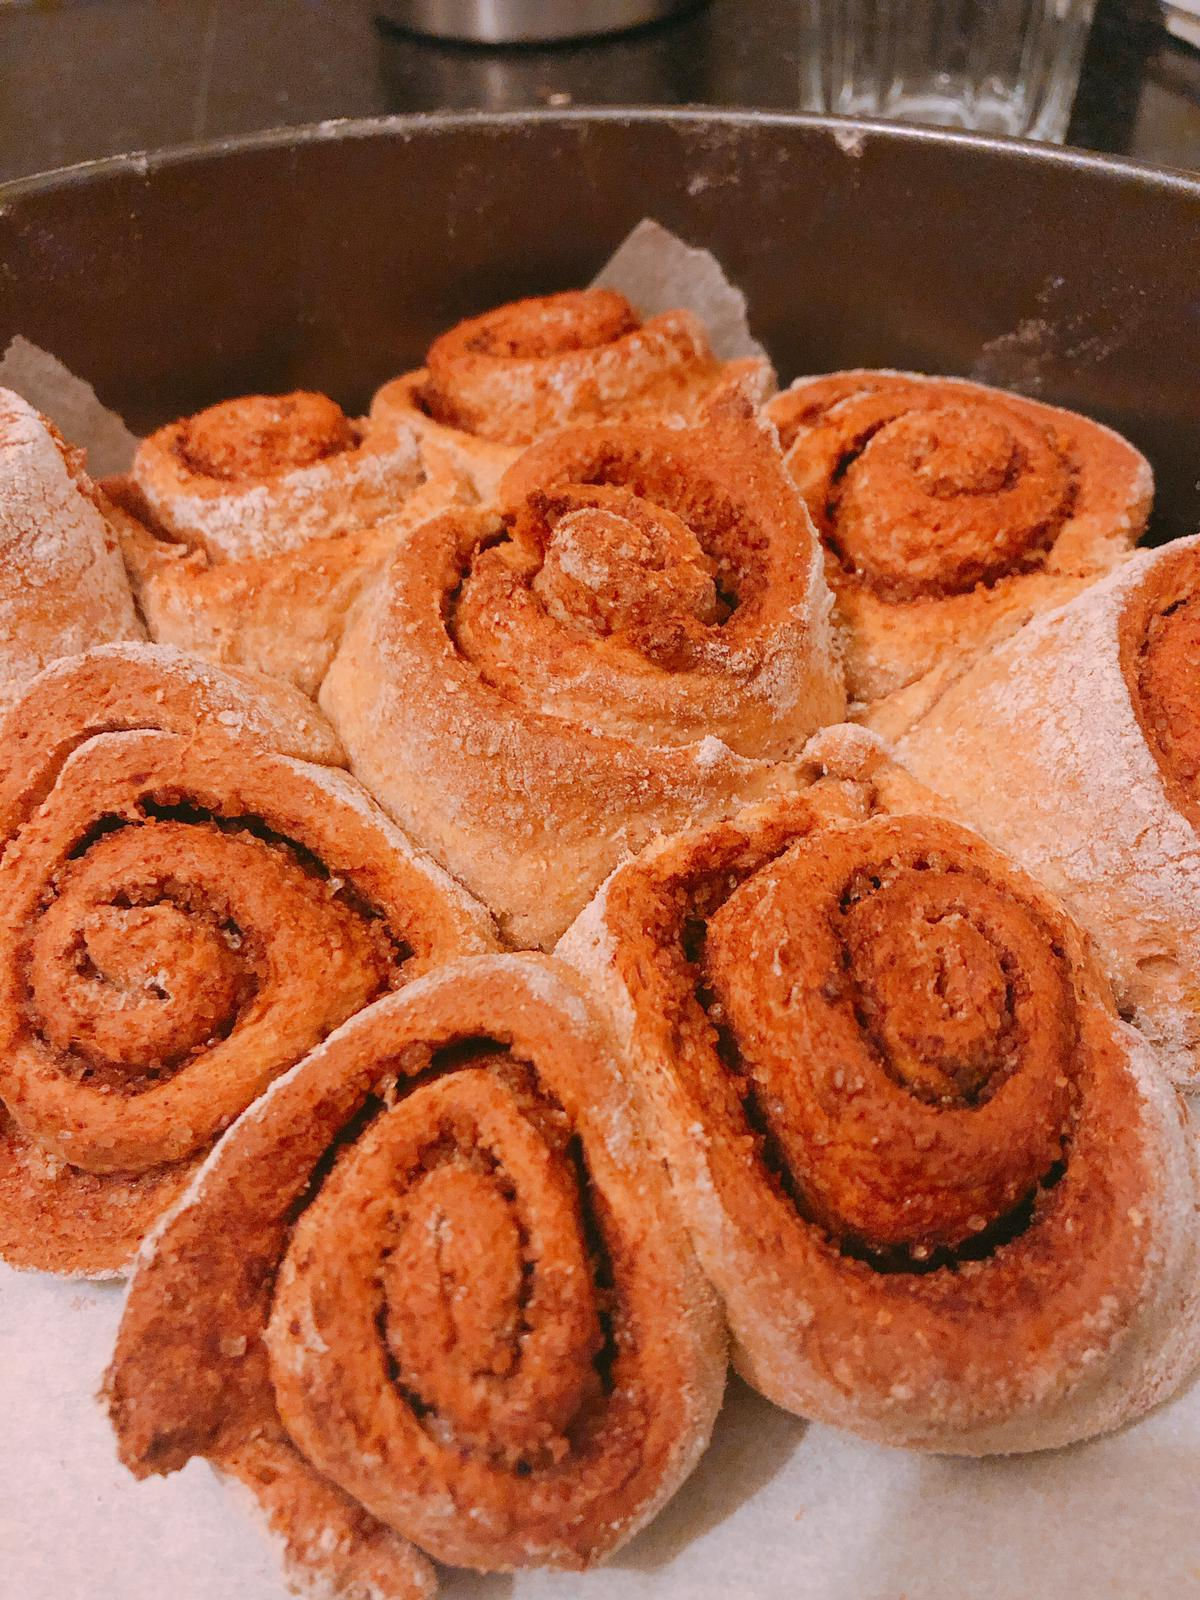 Healthy & Easy-to-Make Cinnamon Rolls